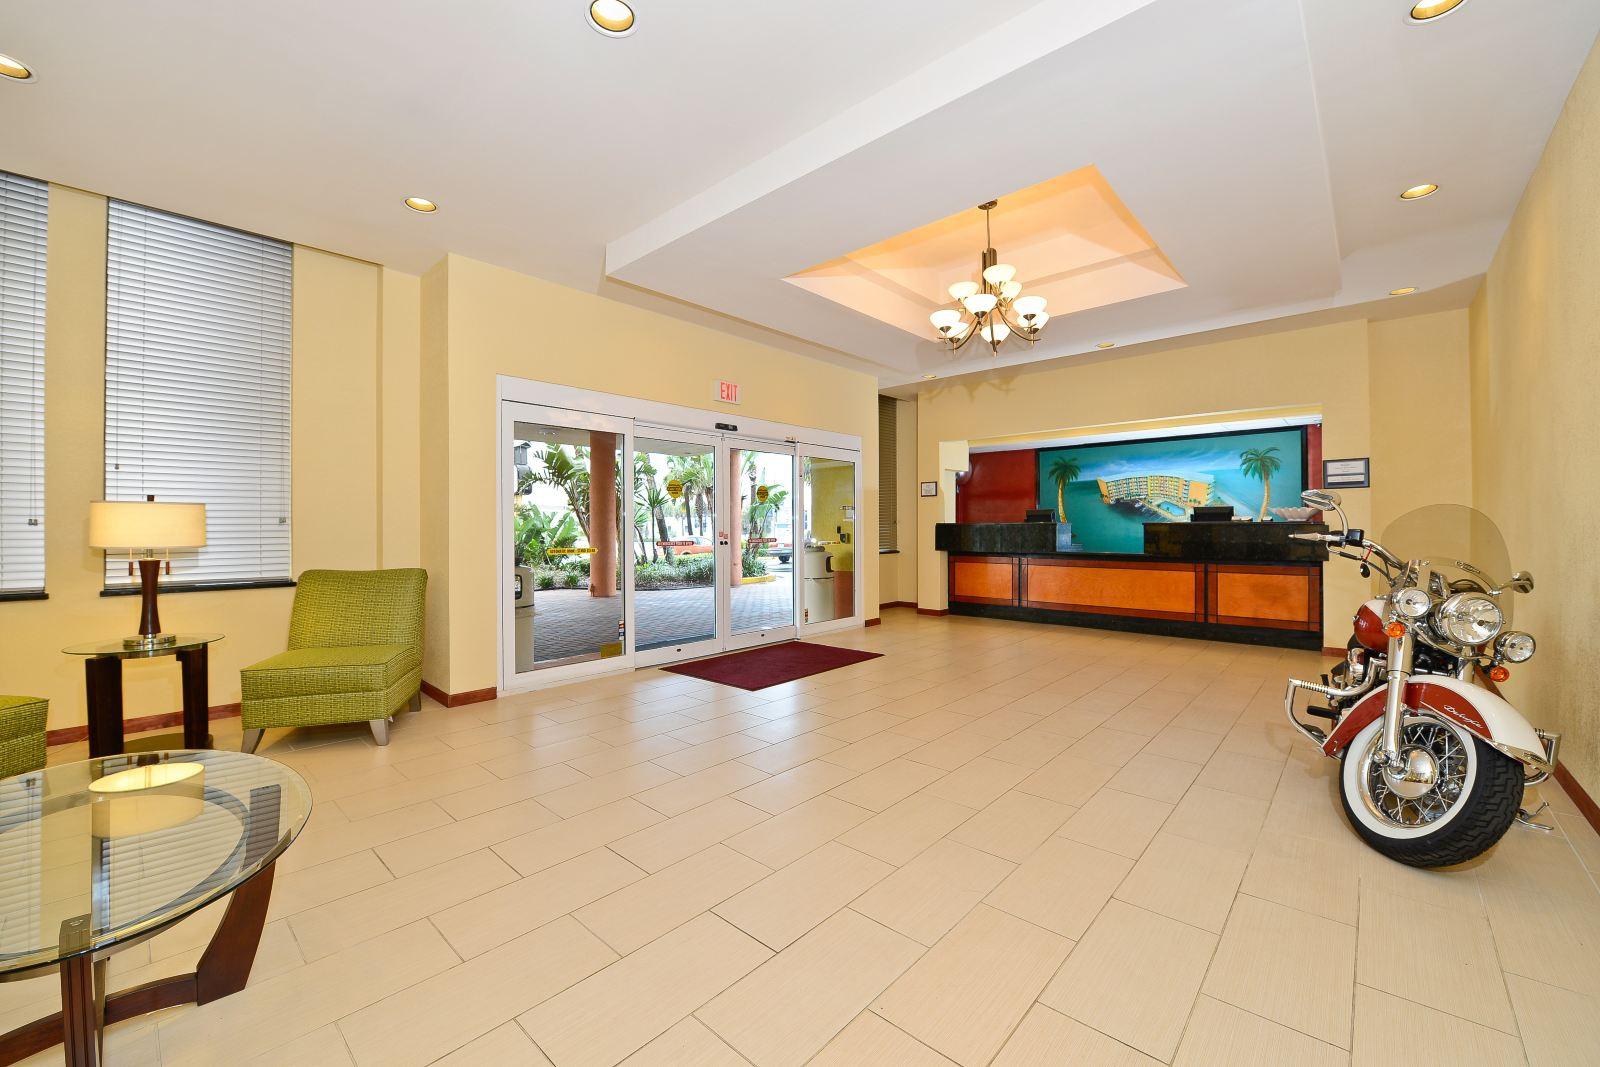 Upscale hotel in daytona beach, fl